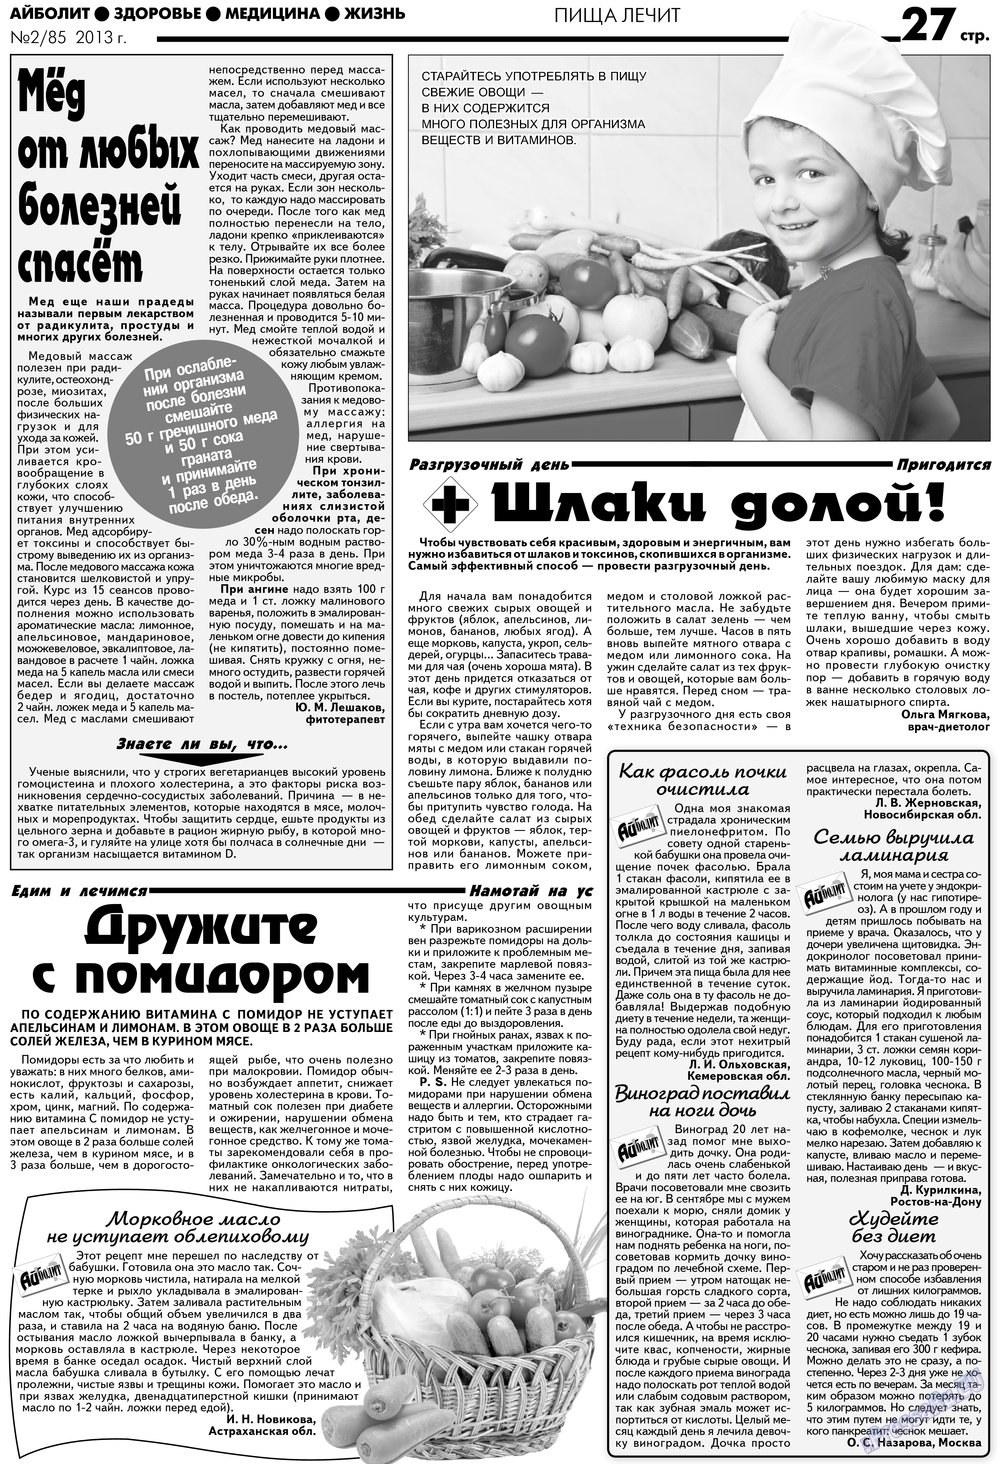 АйБолит (газета). 2013 год, номер 2, стр. 27